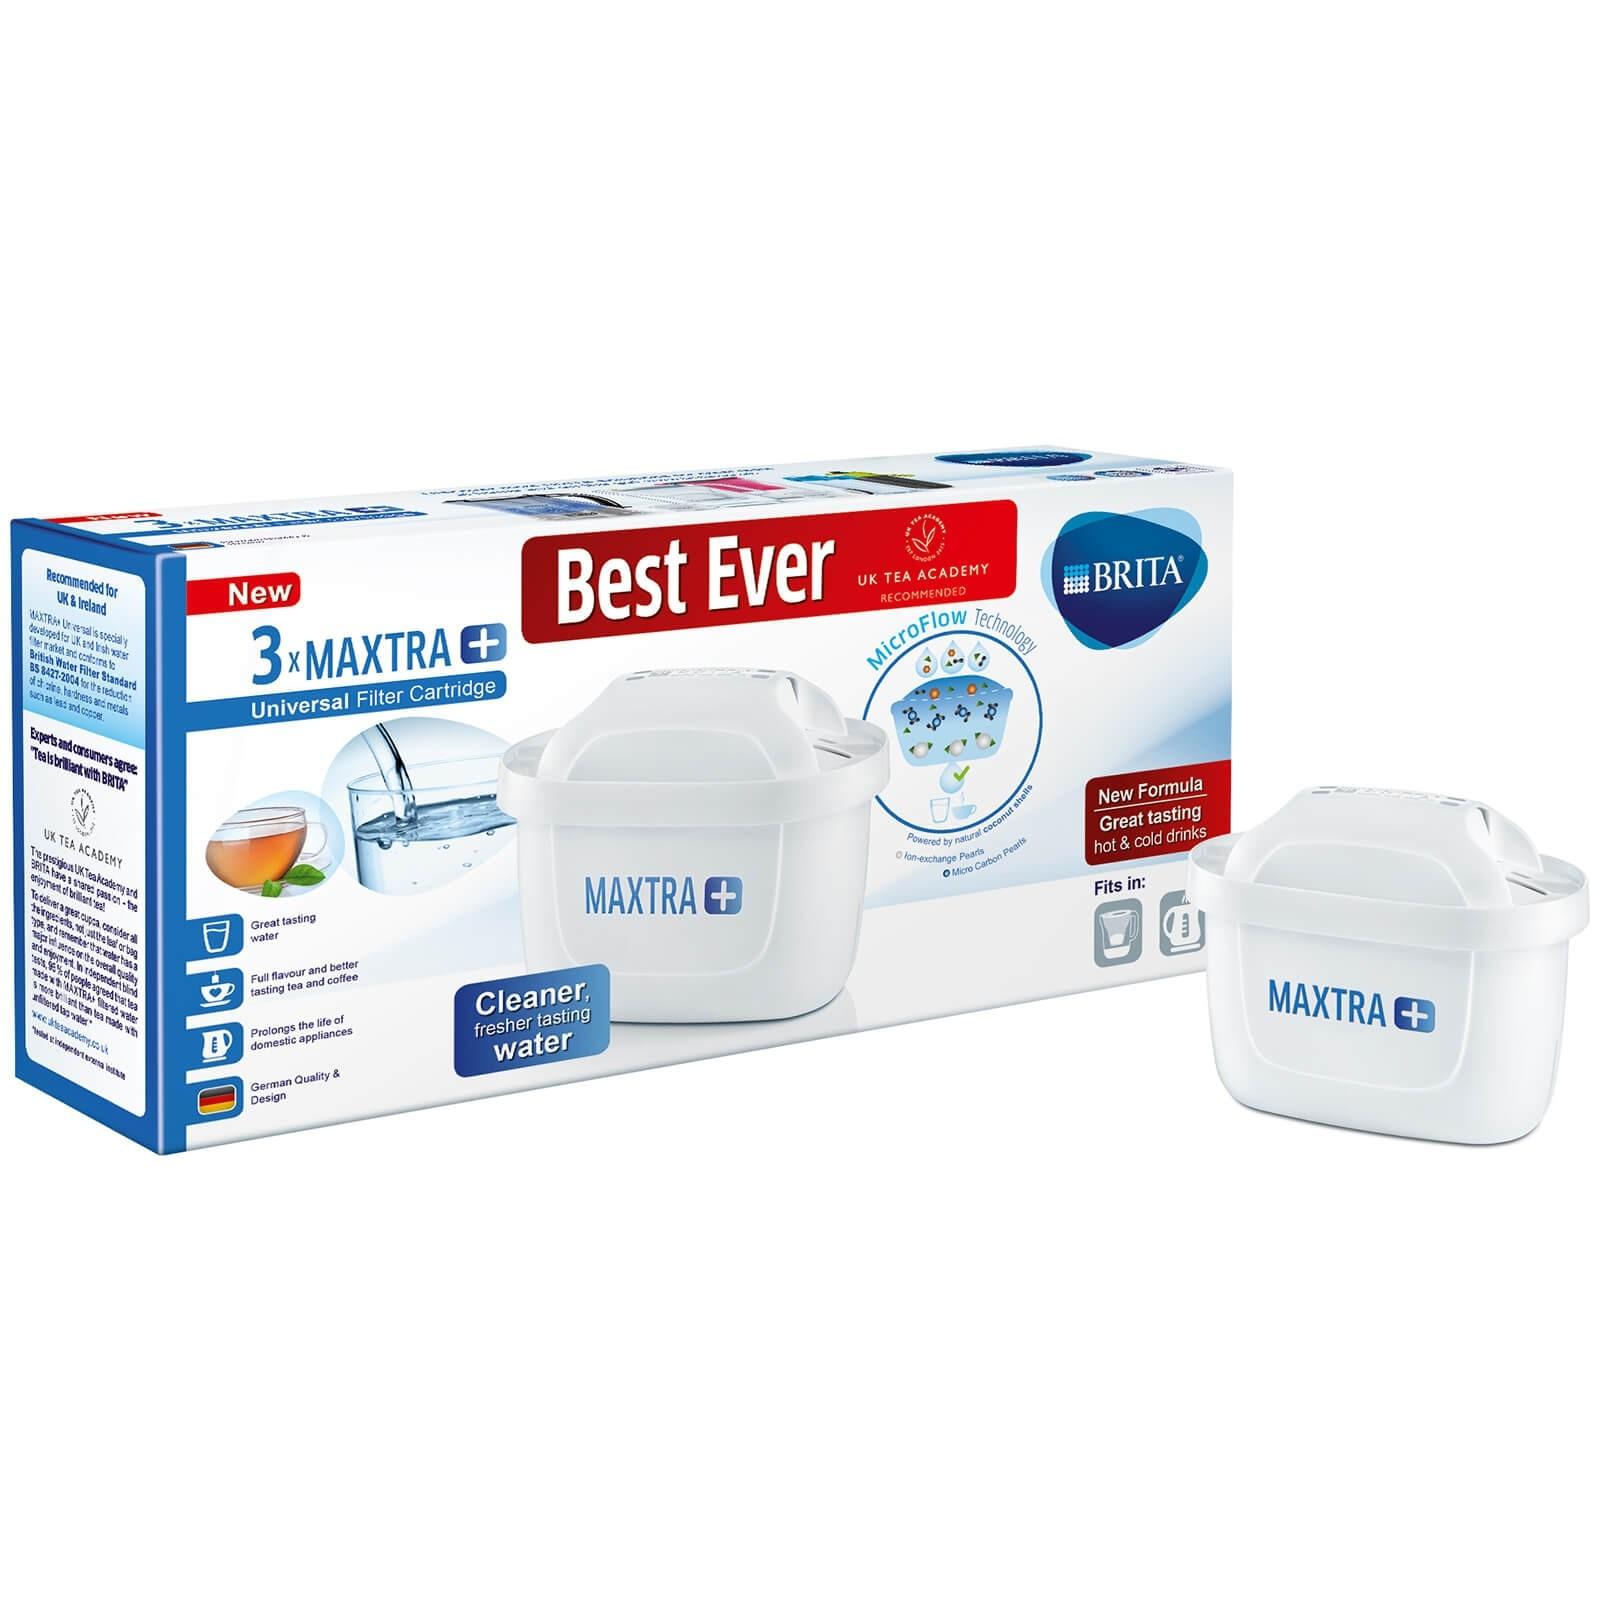 BRITA Maxtra 3 pack